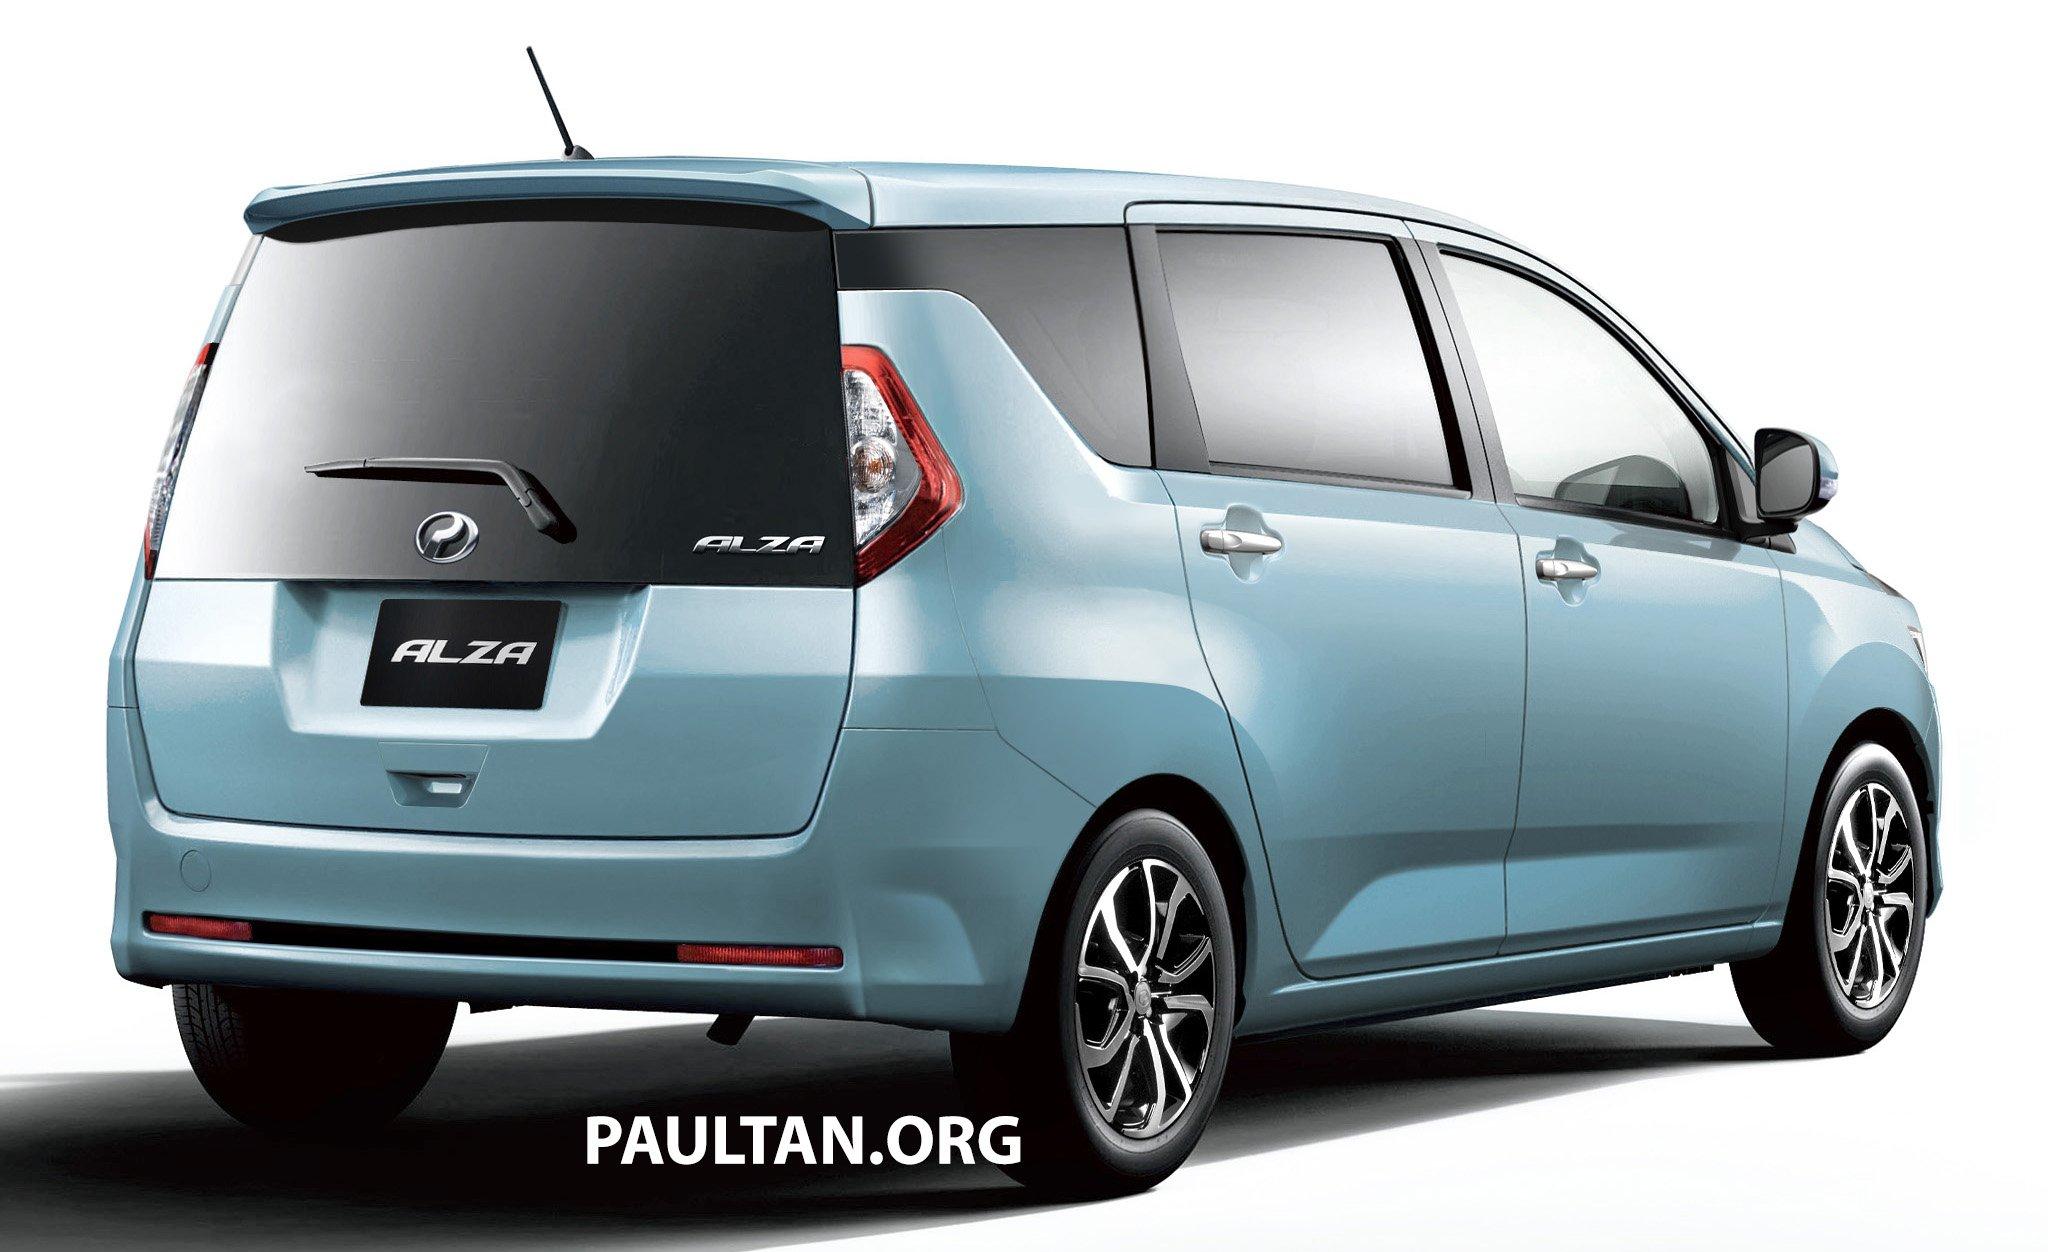 New Perodua Alza Rendered On Daihatsu Mira E S Body Image